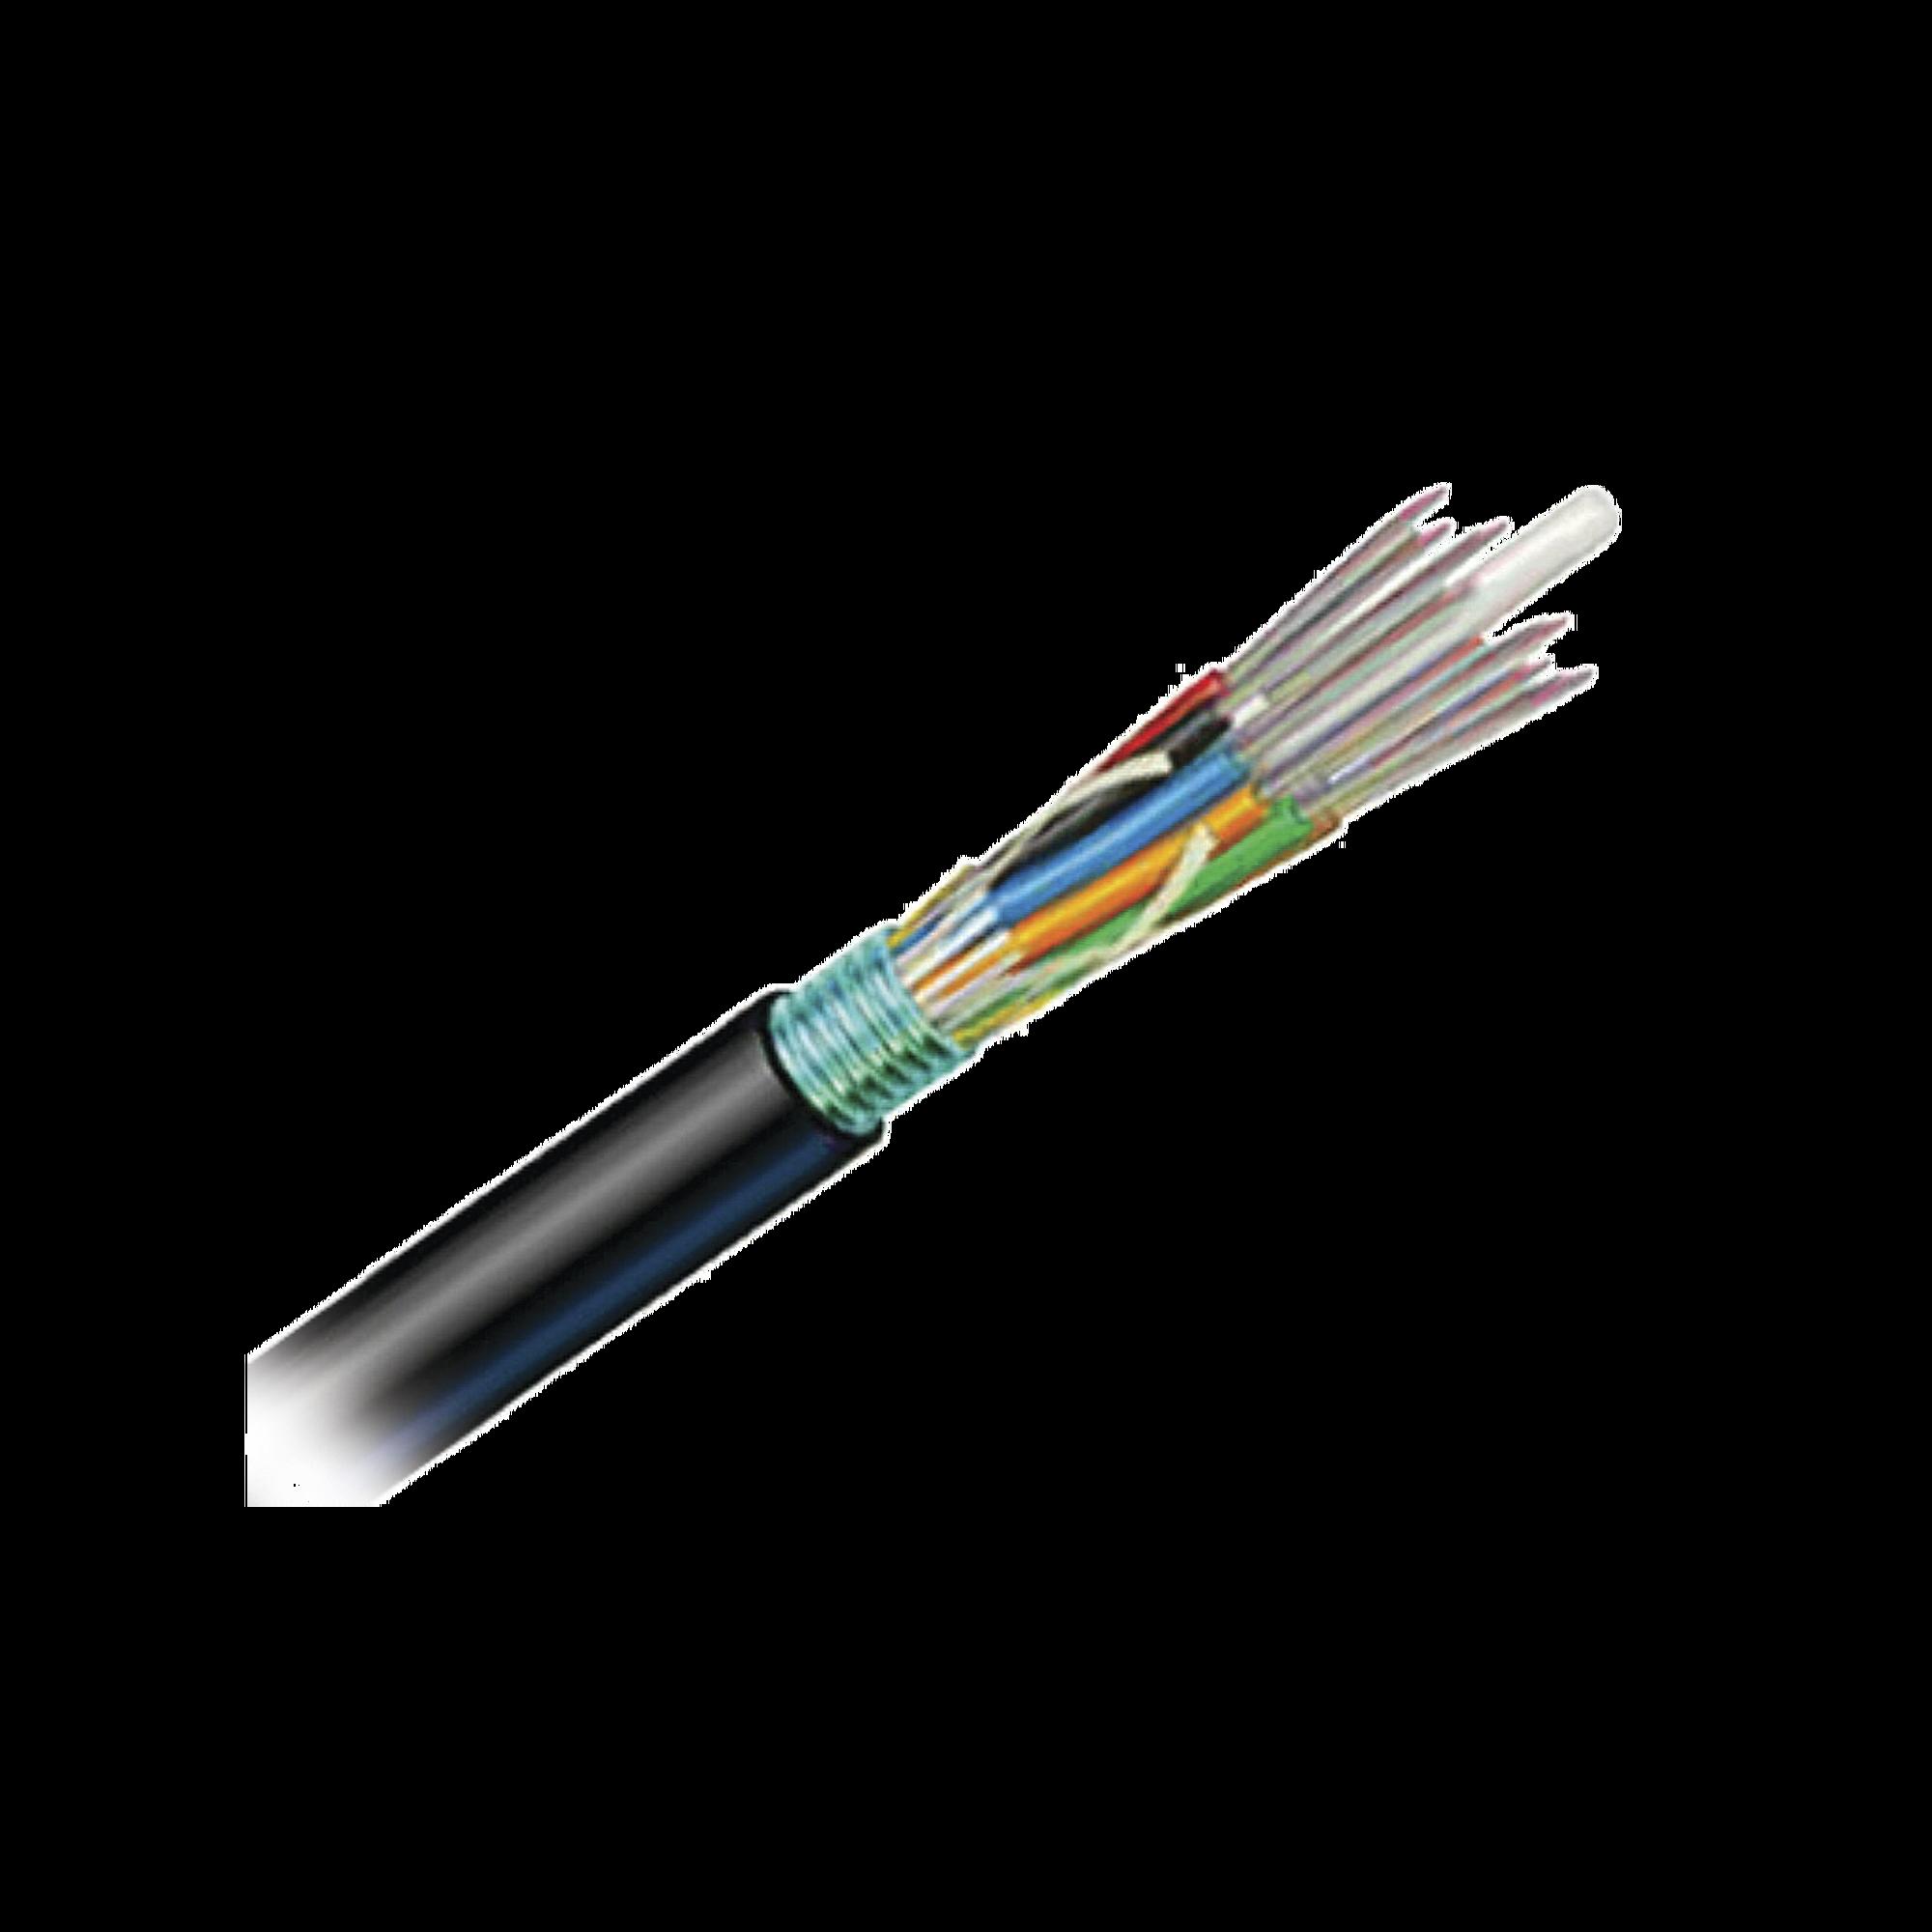 Cable de Fibra optica 6 hilos, OSP (Planta Externa), Armada, Gel, HDPE (Polietileno de alta densidad), Multimodo OM3 50/125 Optimizada, 1 Metro